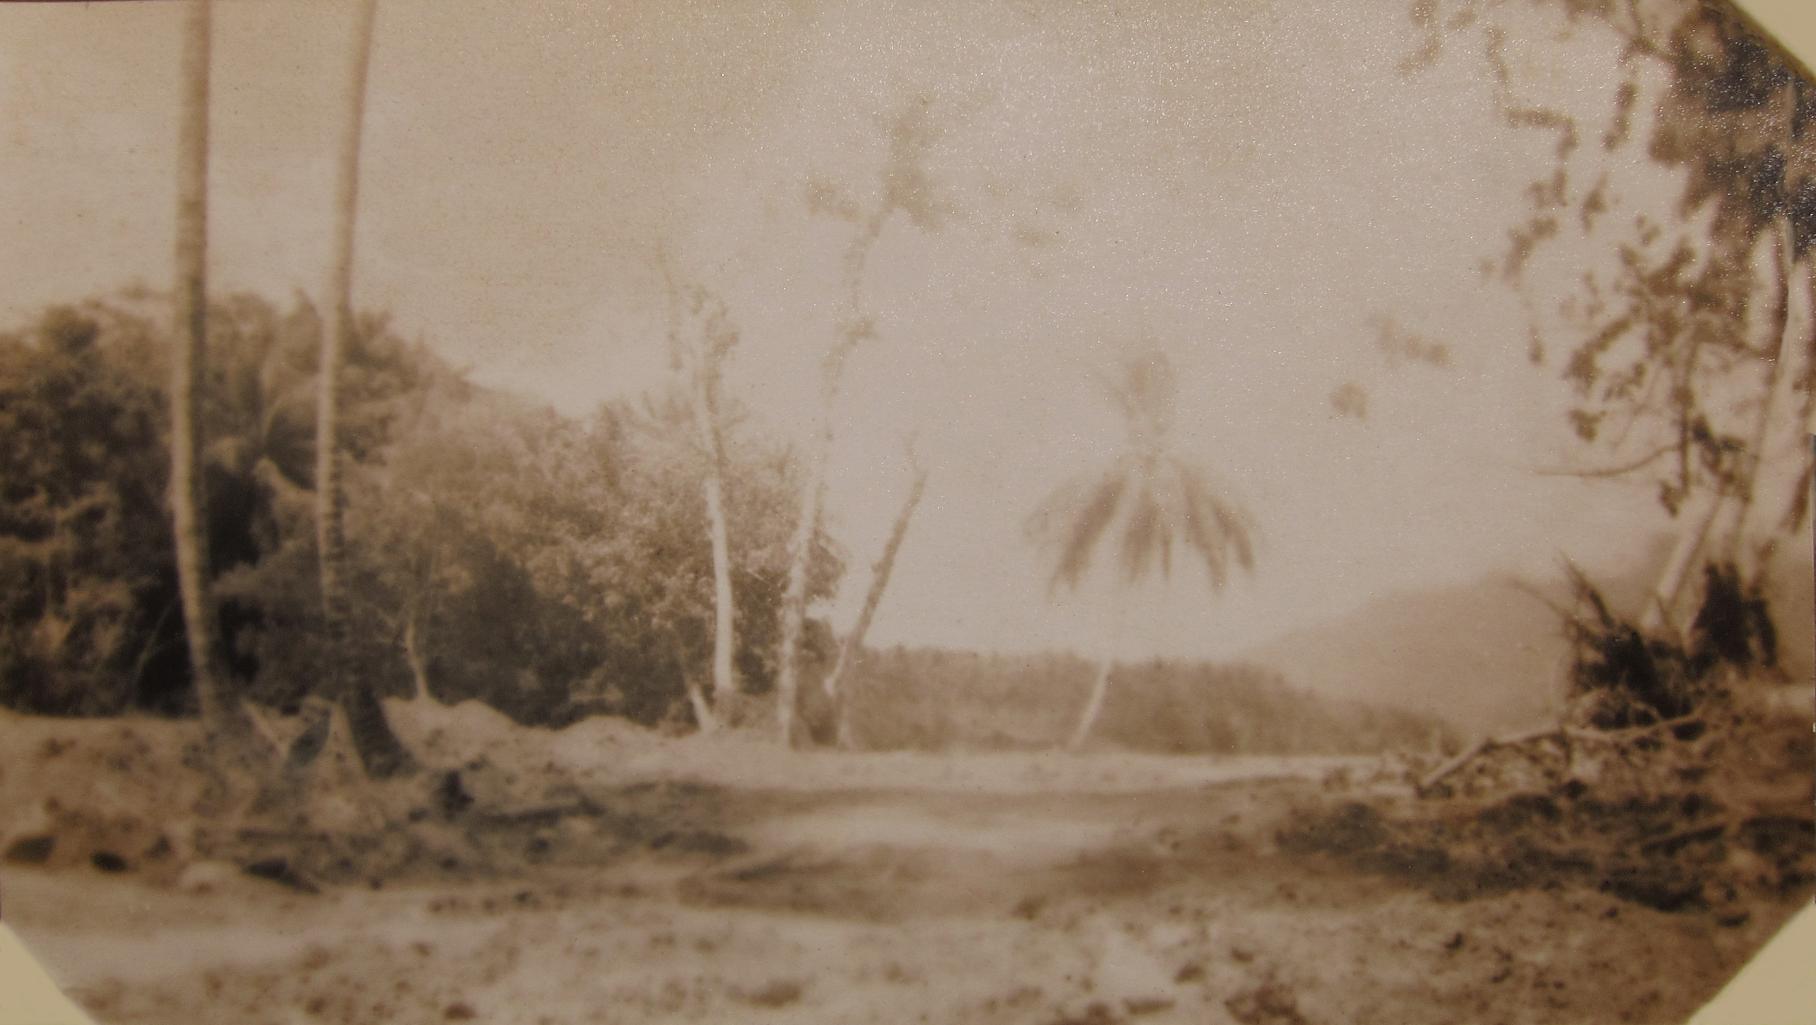 IMG_7804 Scene Milne Bay RAAF 1943 War Diary upload